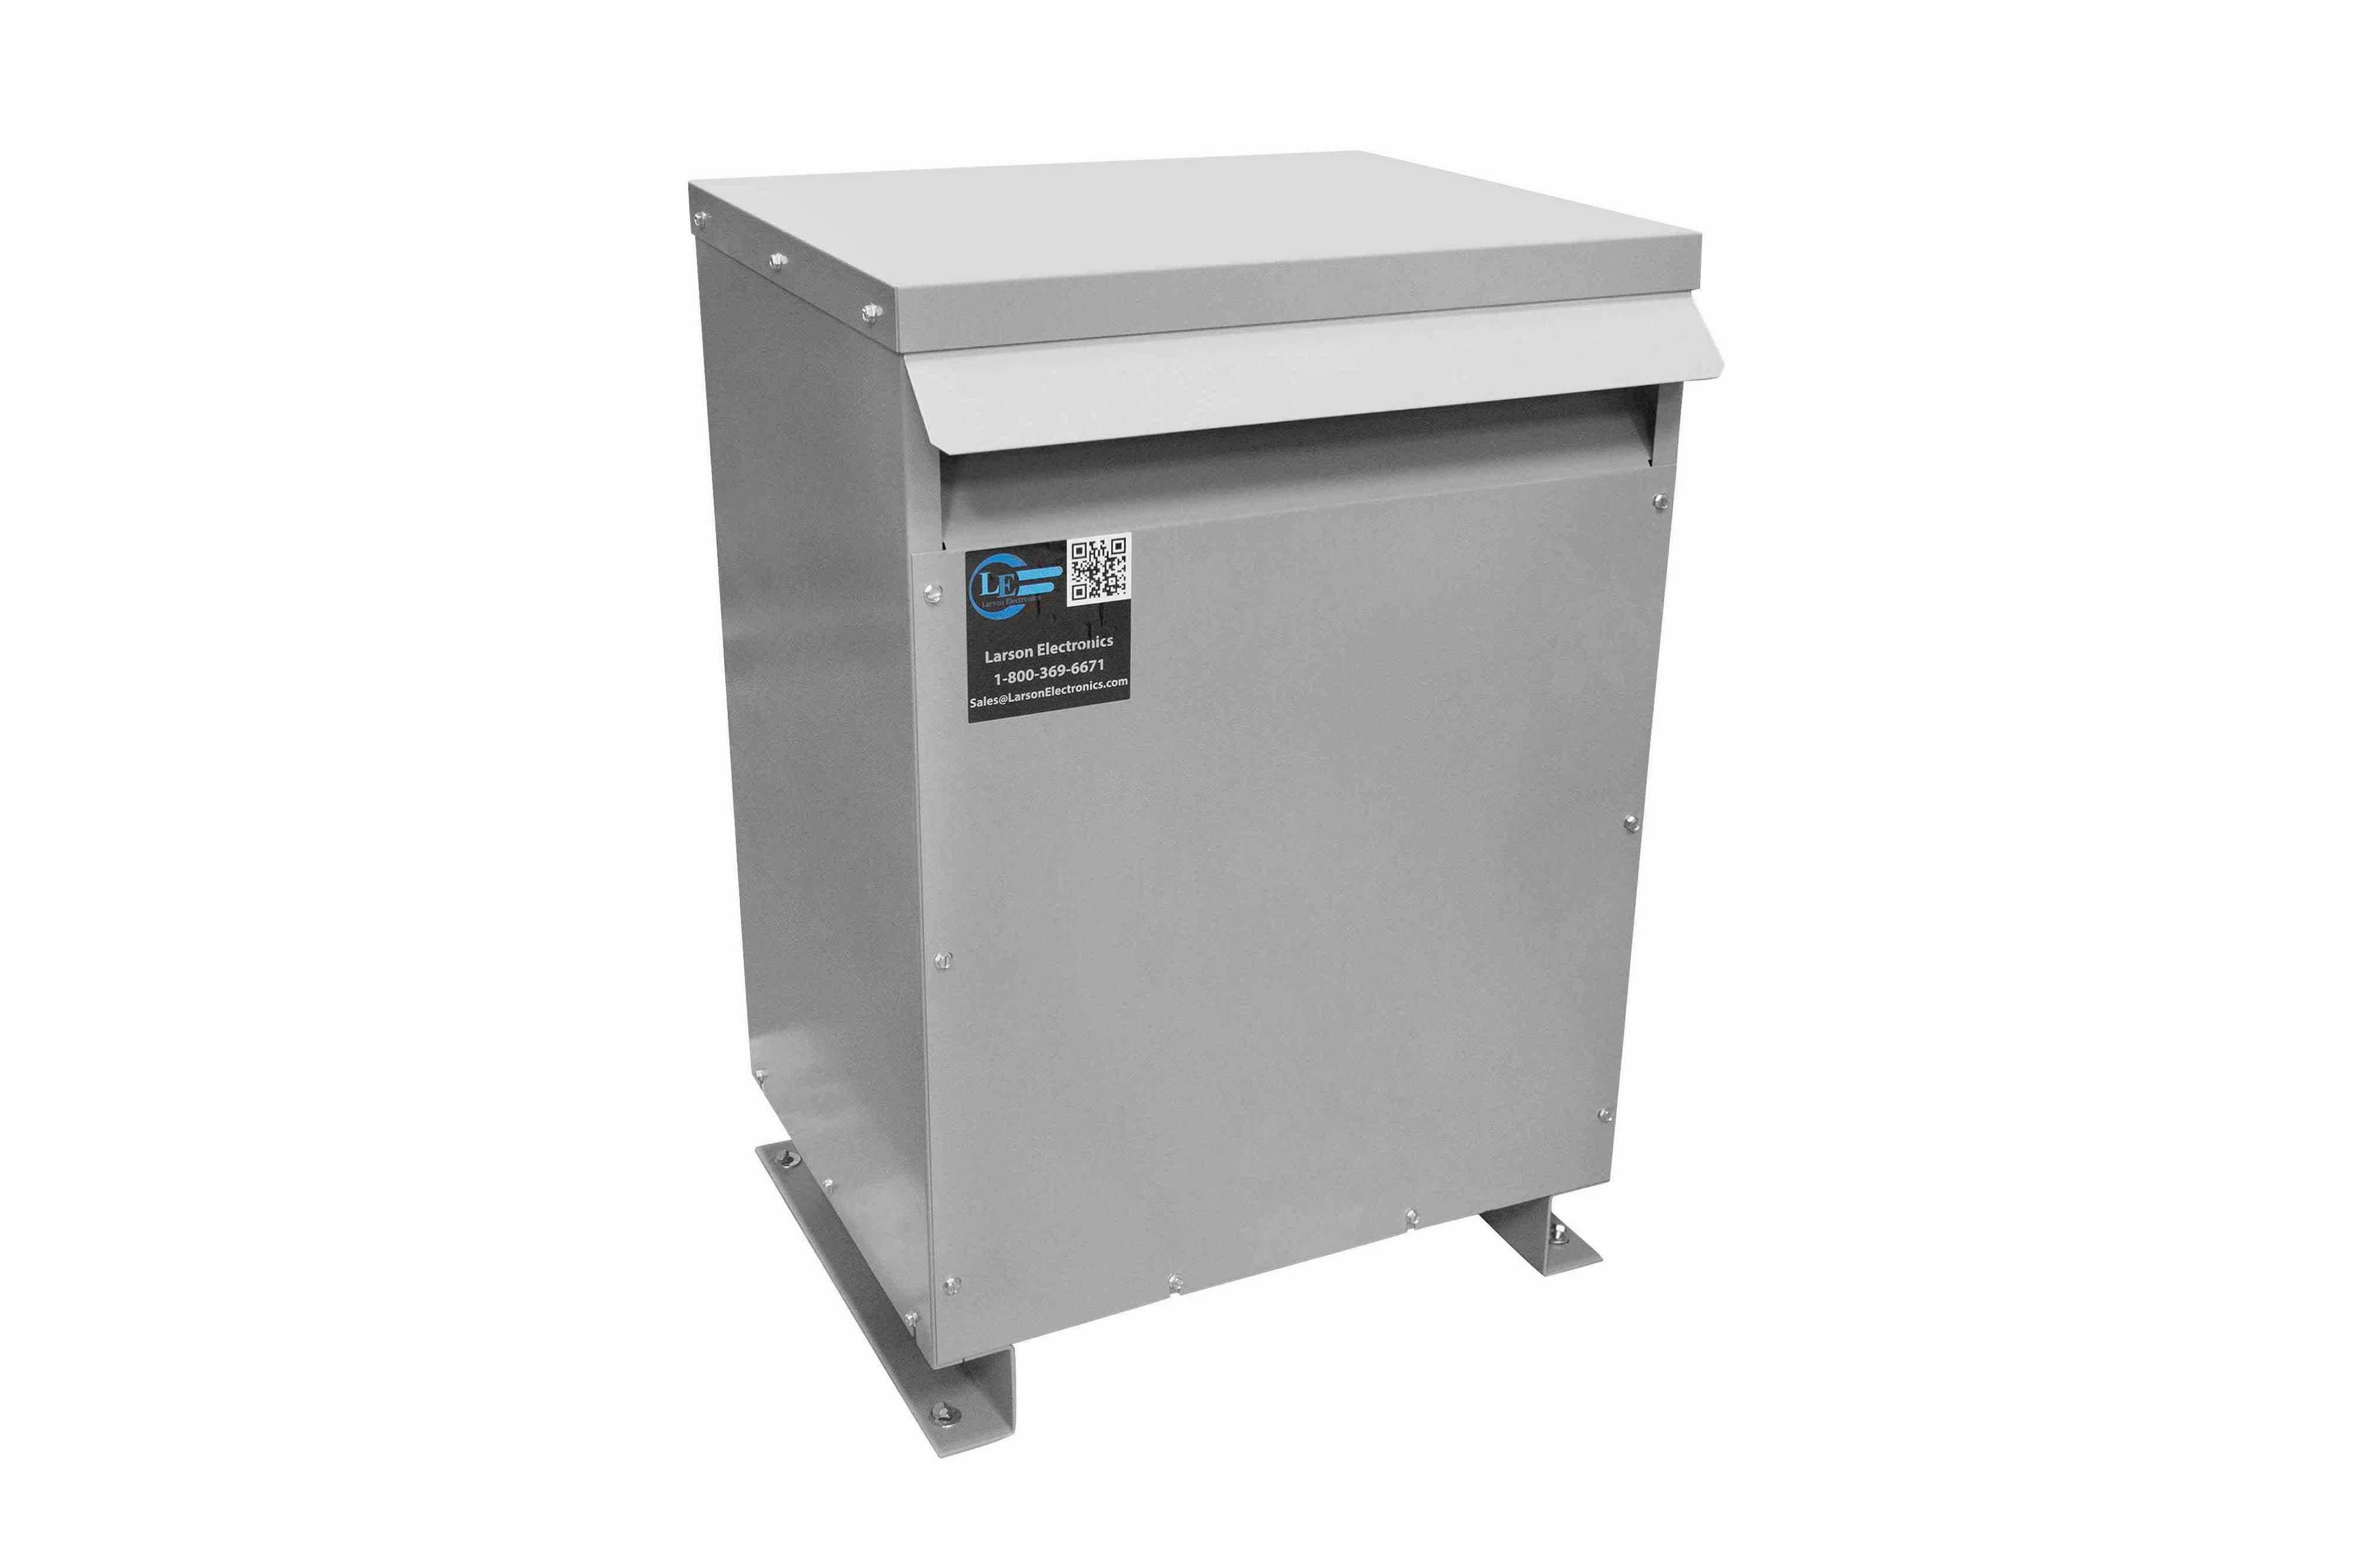 150 kVA 3PH Isolation Transformer, 380V Wye Primary, 240V Delta Secondary, N3R, Ventilated, 60 Hz